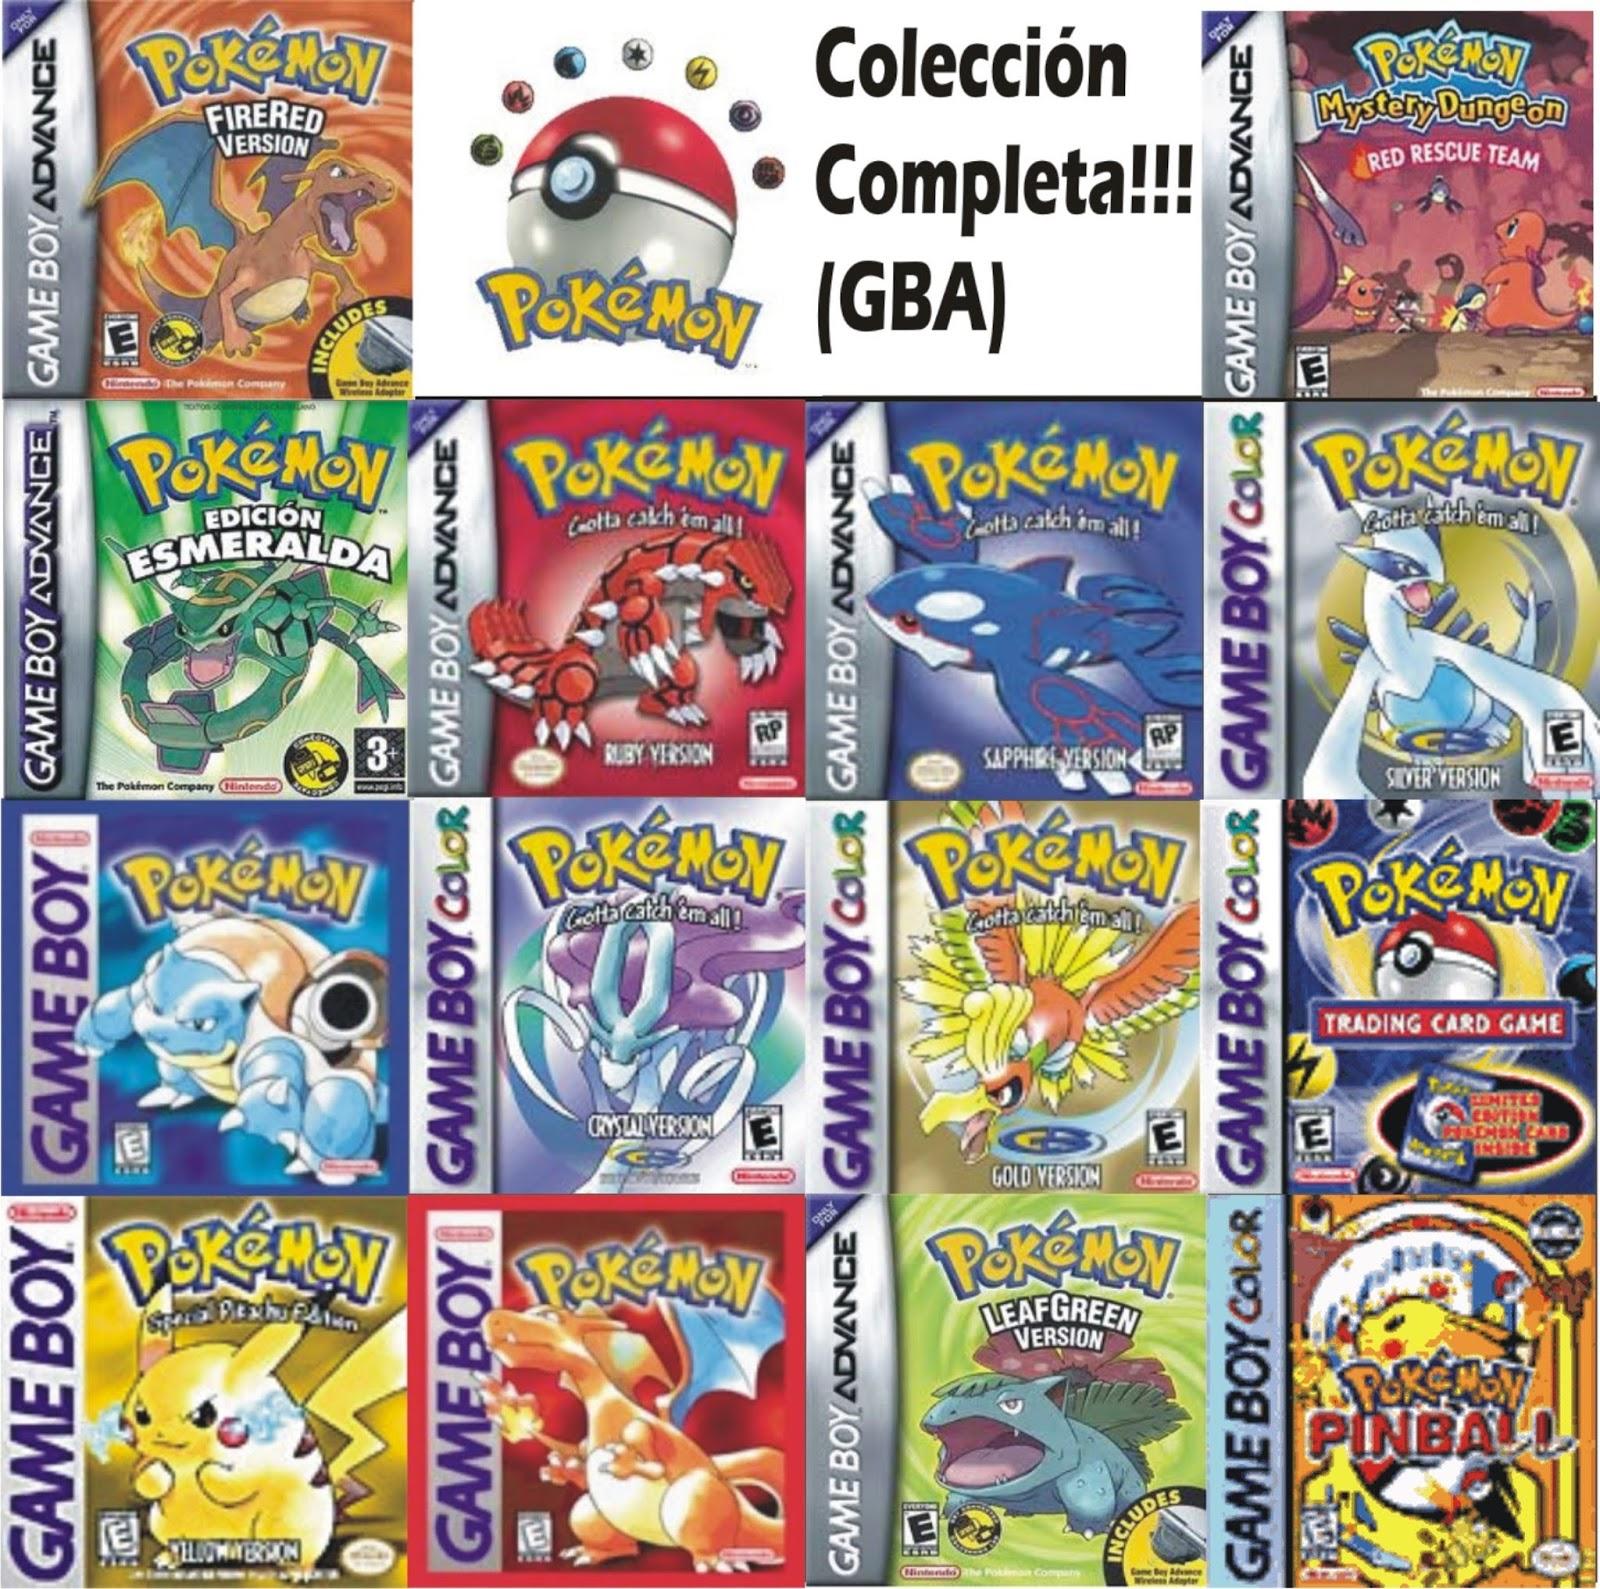 Download Dj Akimilaku 2018 Terbaru: Download Kumpulan Game Pokemon GBA Terbaru Gratis 2018